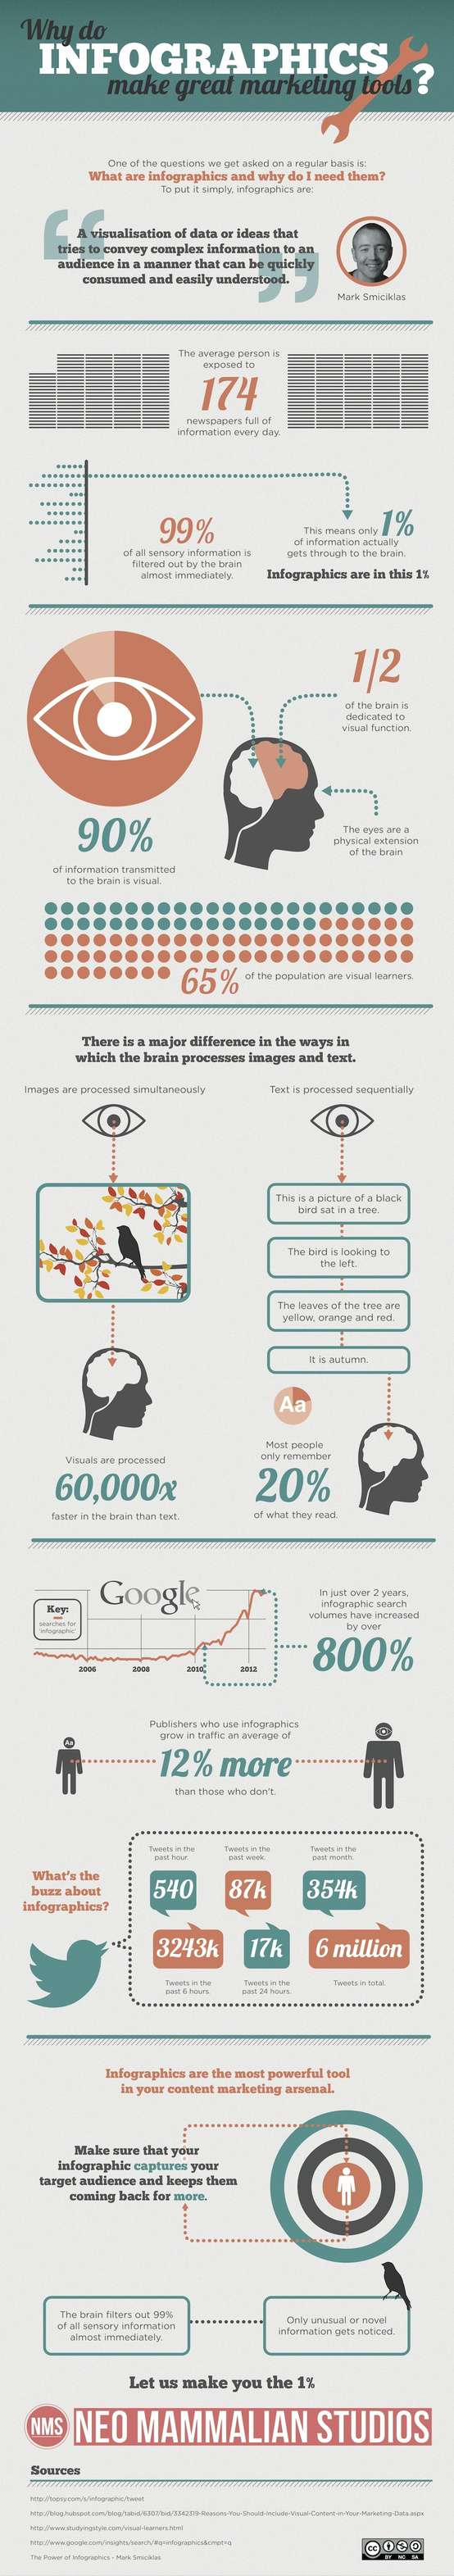 infografica content marketing